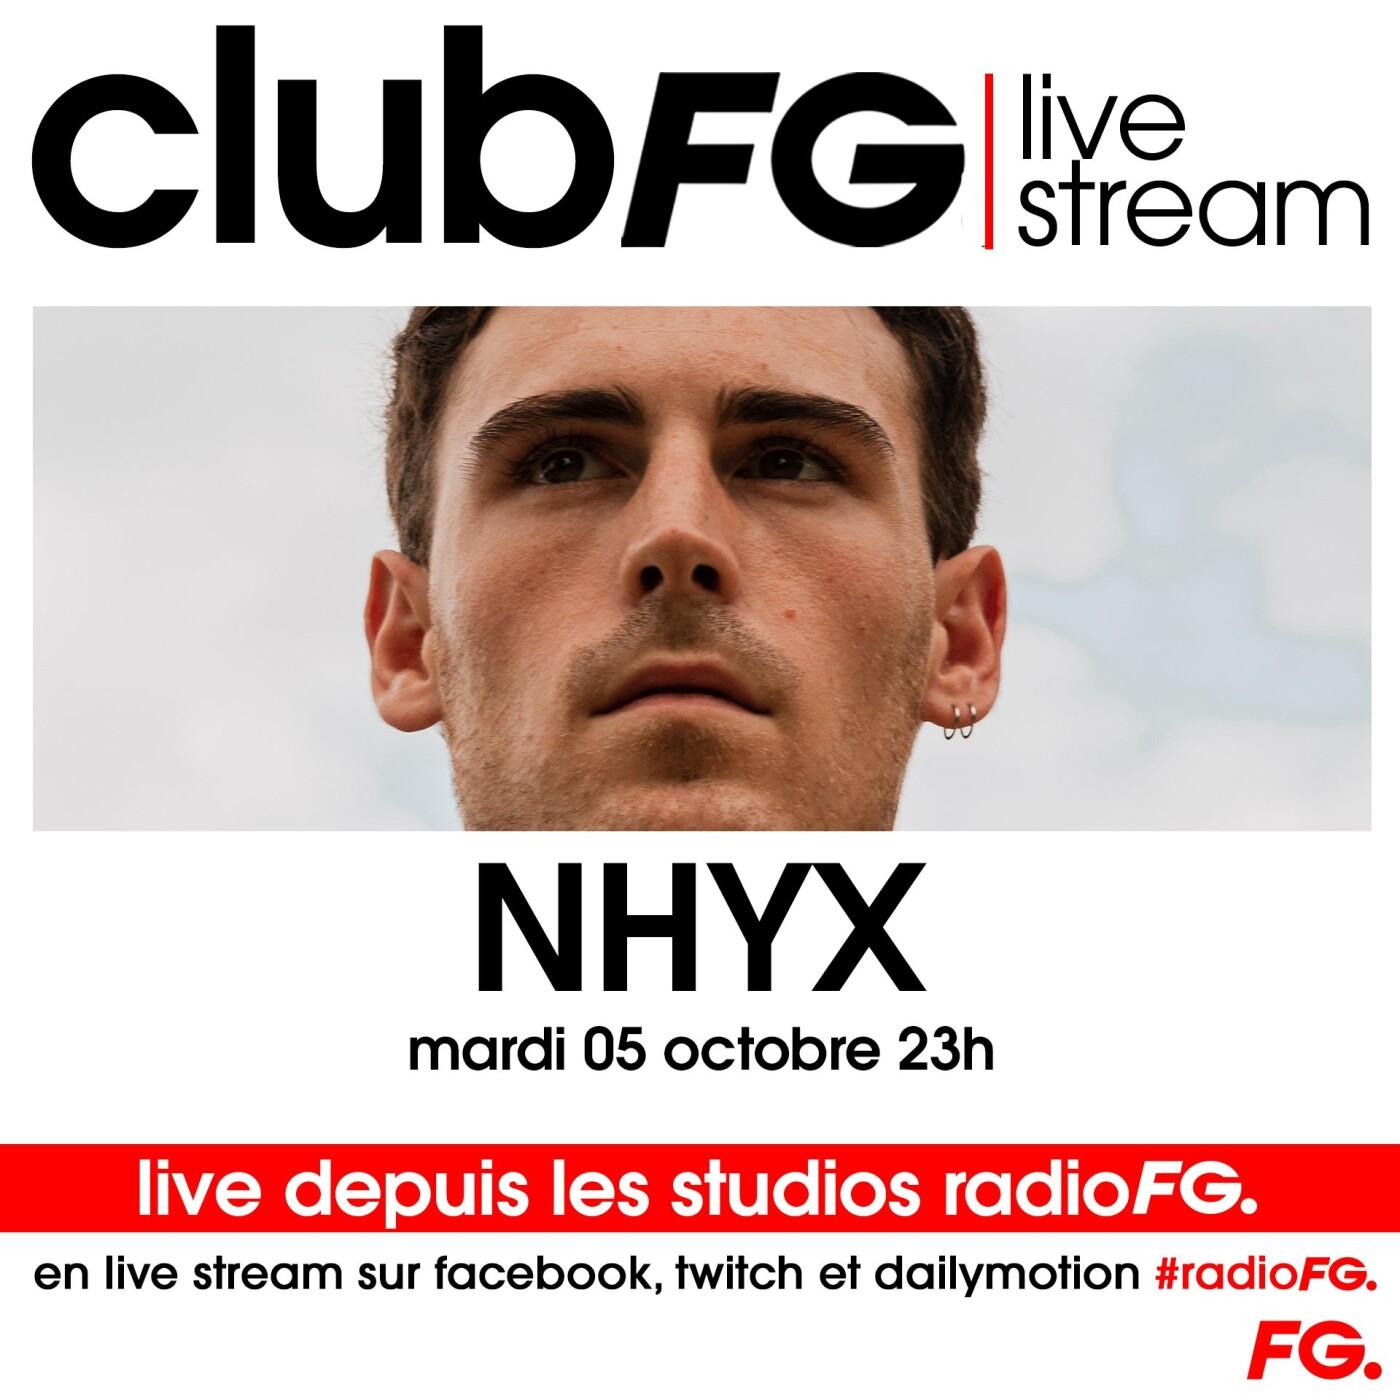 CLUB FG LIVE STREAM : NHYX